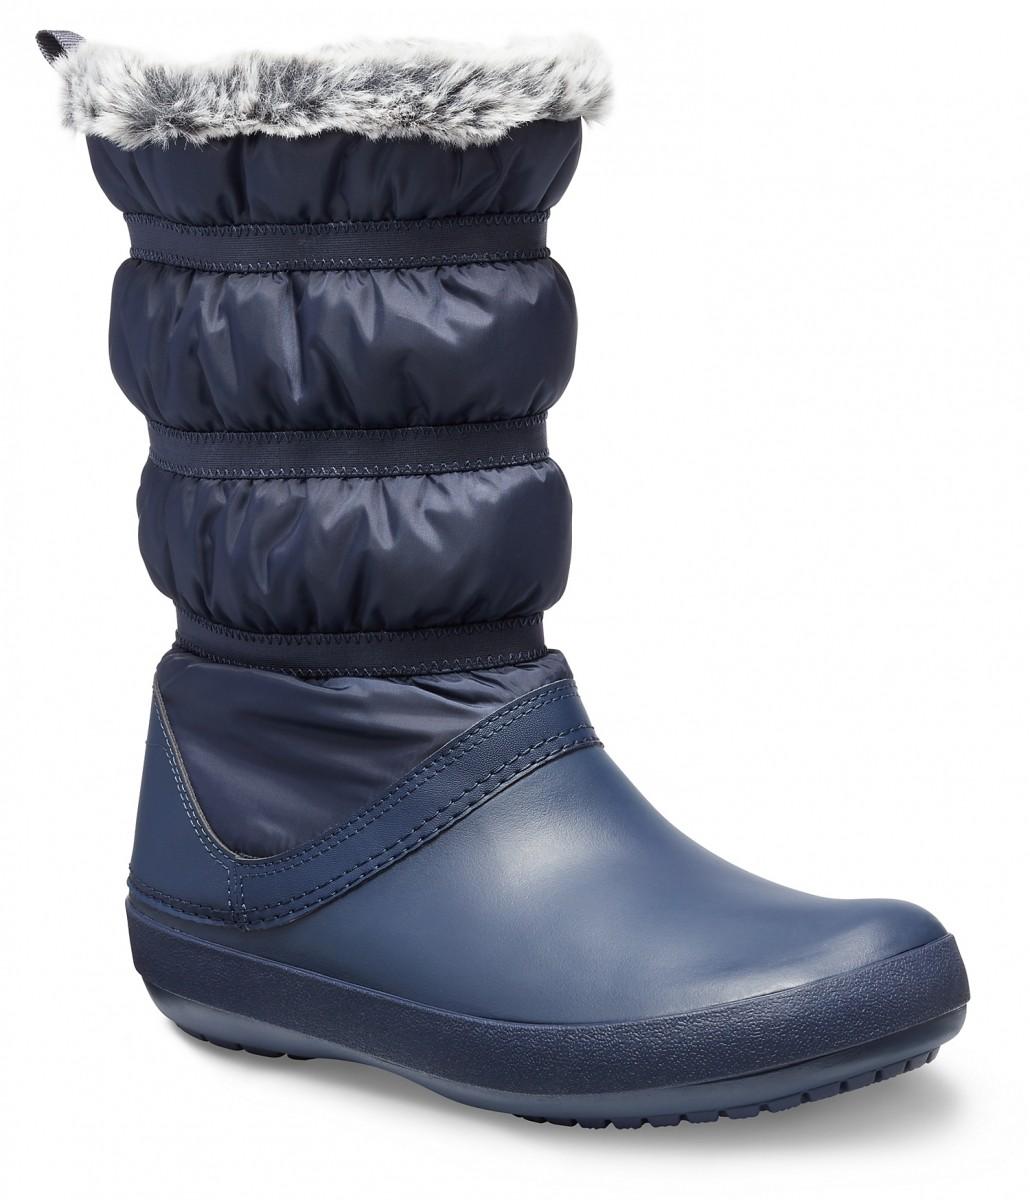 Dámské sněhule Crocs Crocband Winter Boot Women - Navy 38b9202394